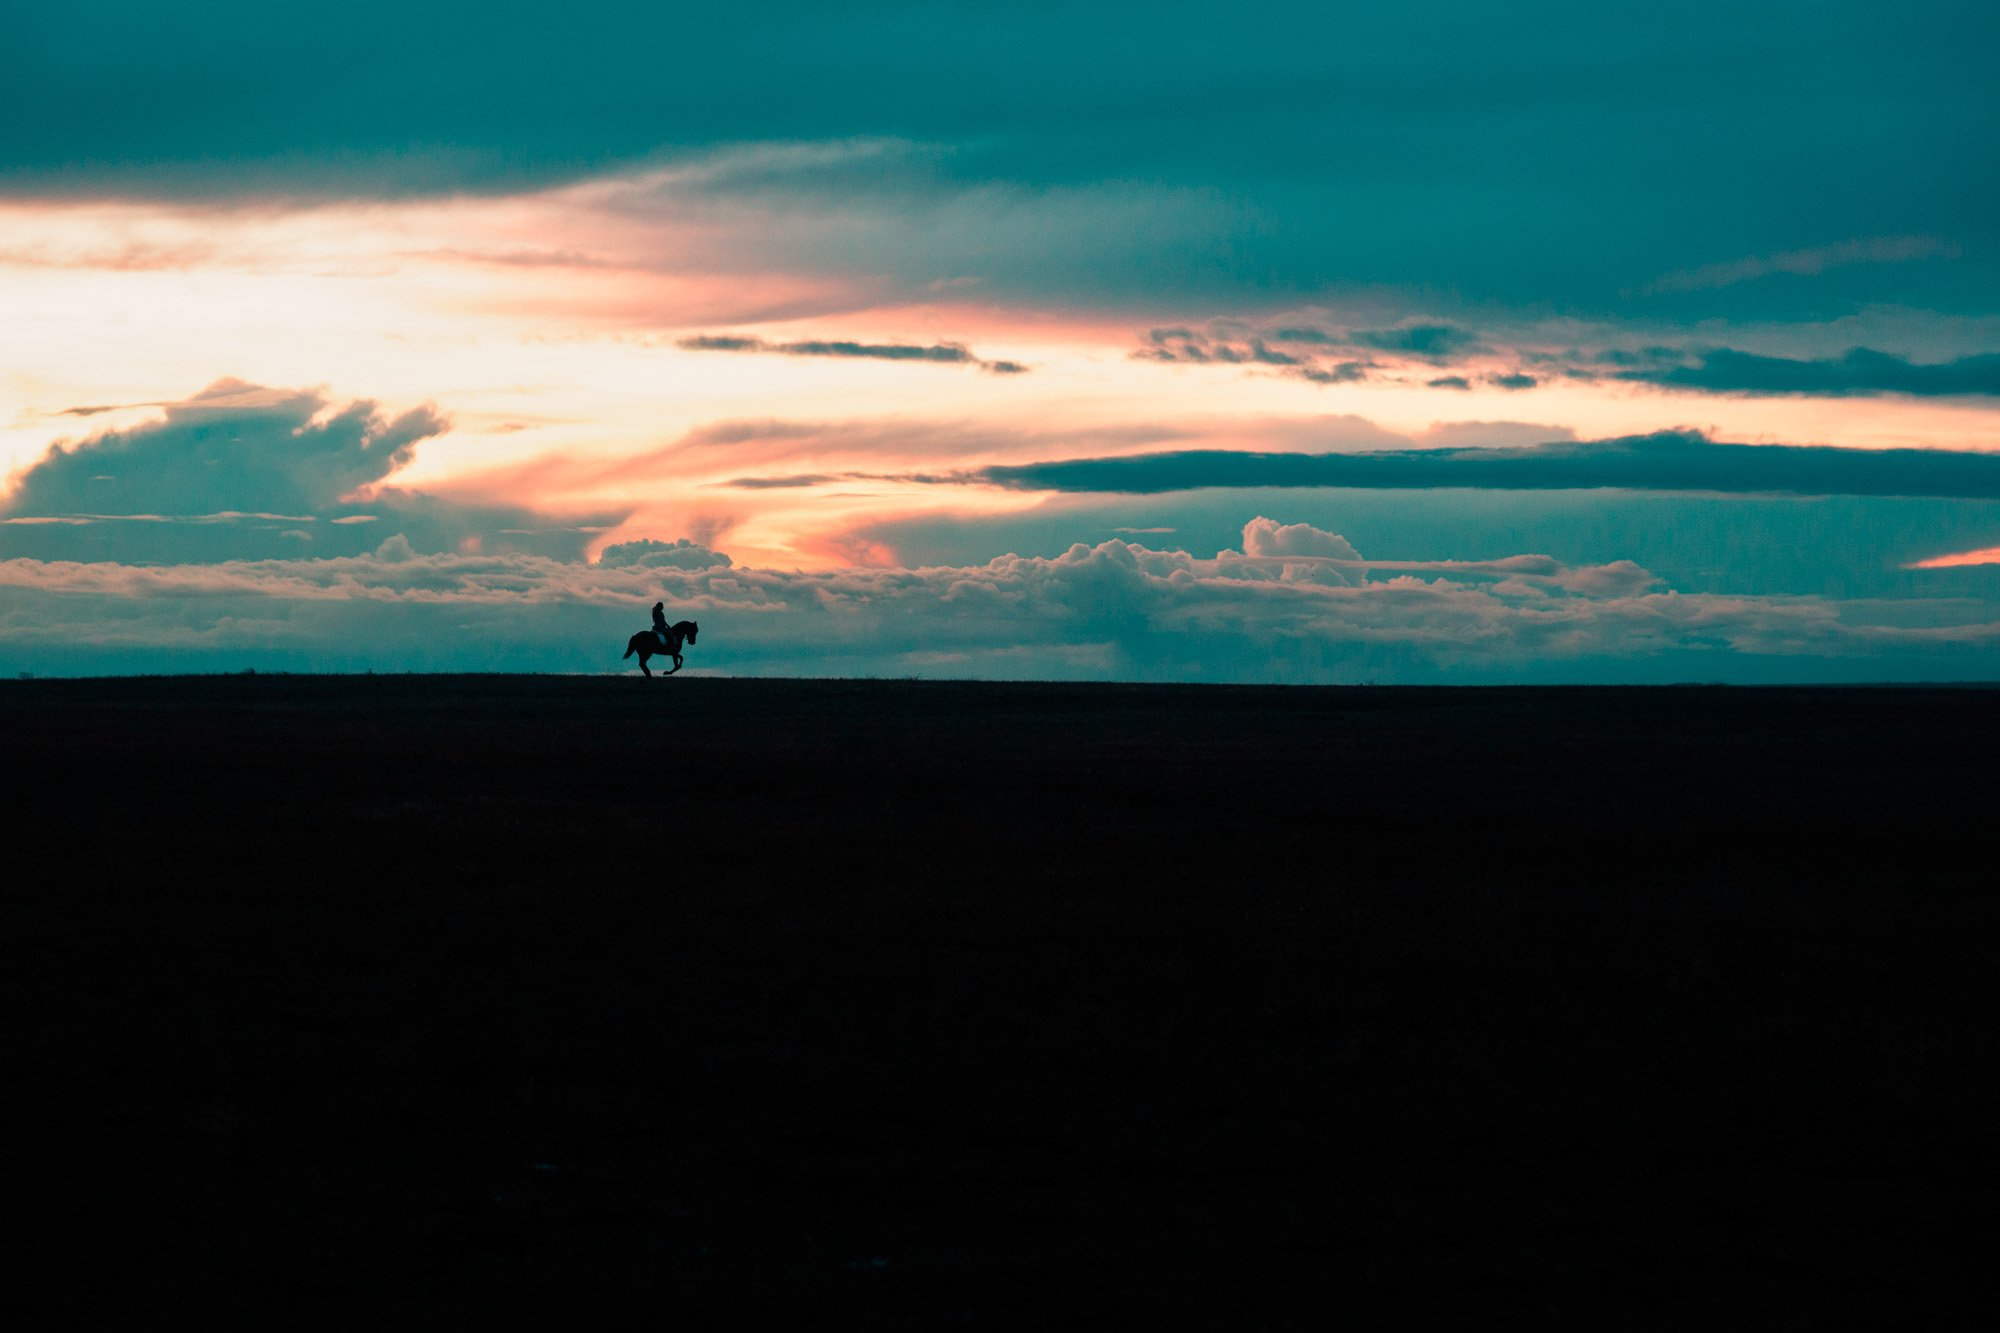 Atardecer caballo - Linzex